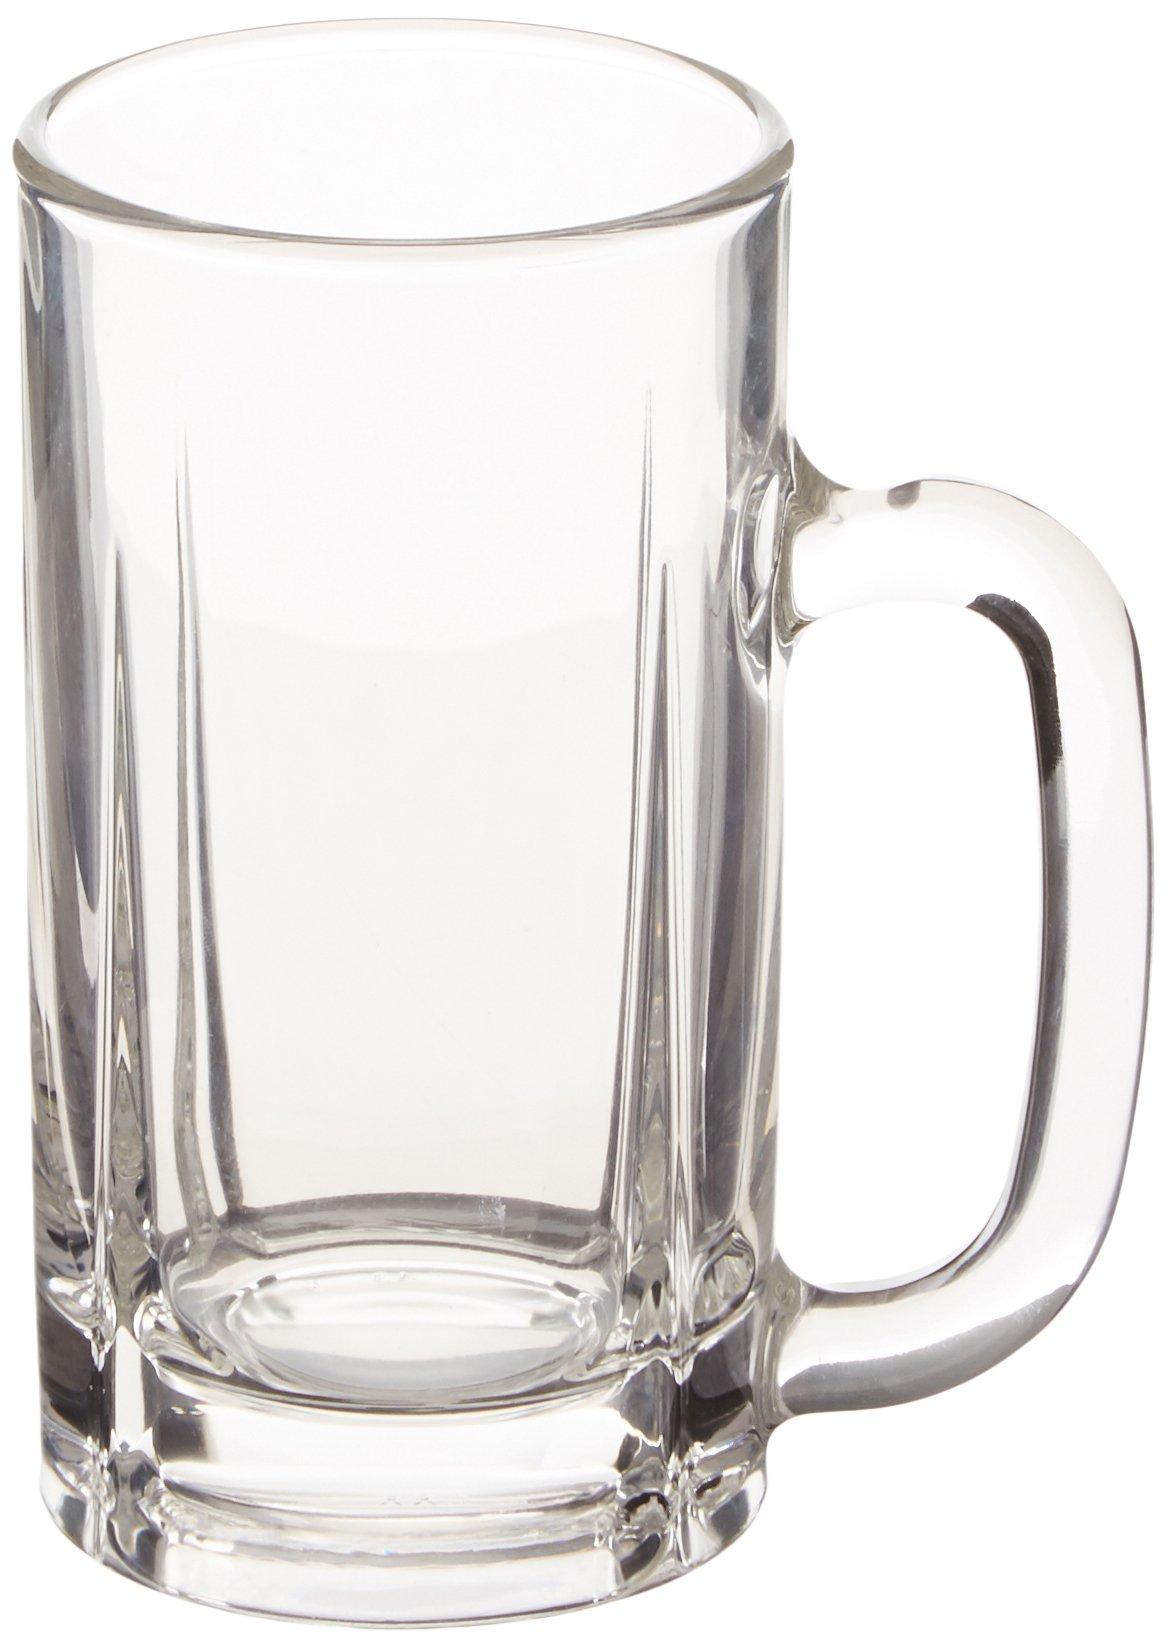 Mikasa Brewmaster's Traditional Glass Beer Mug, 16-Ounce, Set of 4 Mugs